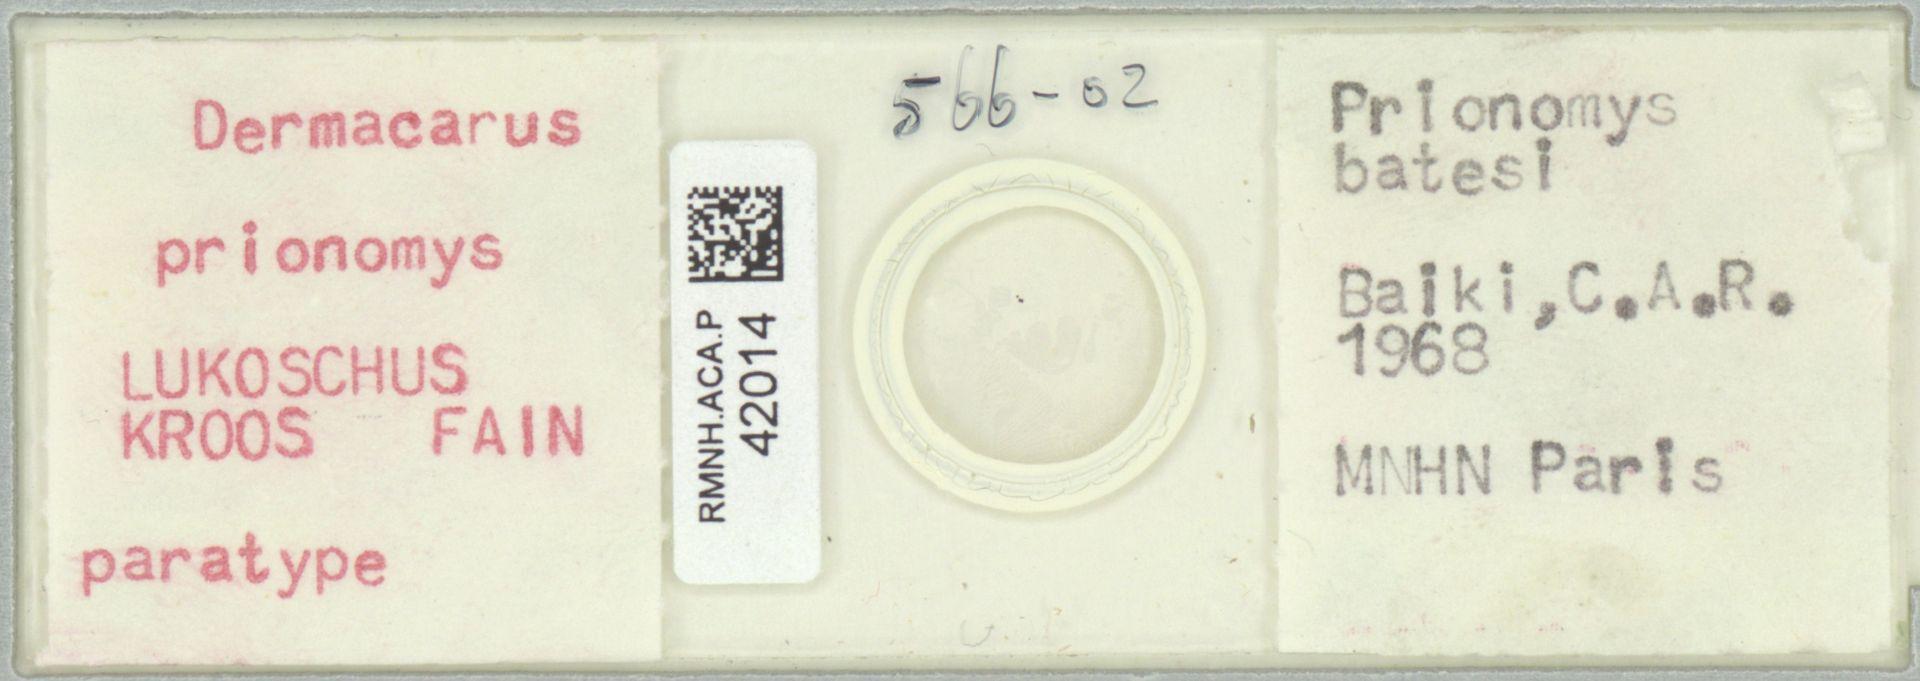 RMNH.ACA.P.42014   Dermacarus prionomys LUKOSCHUS KROOS FAIN